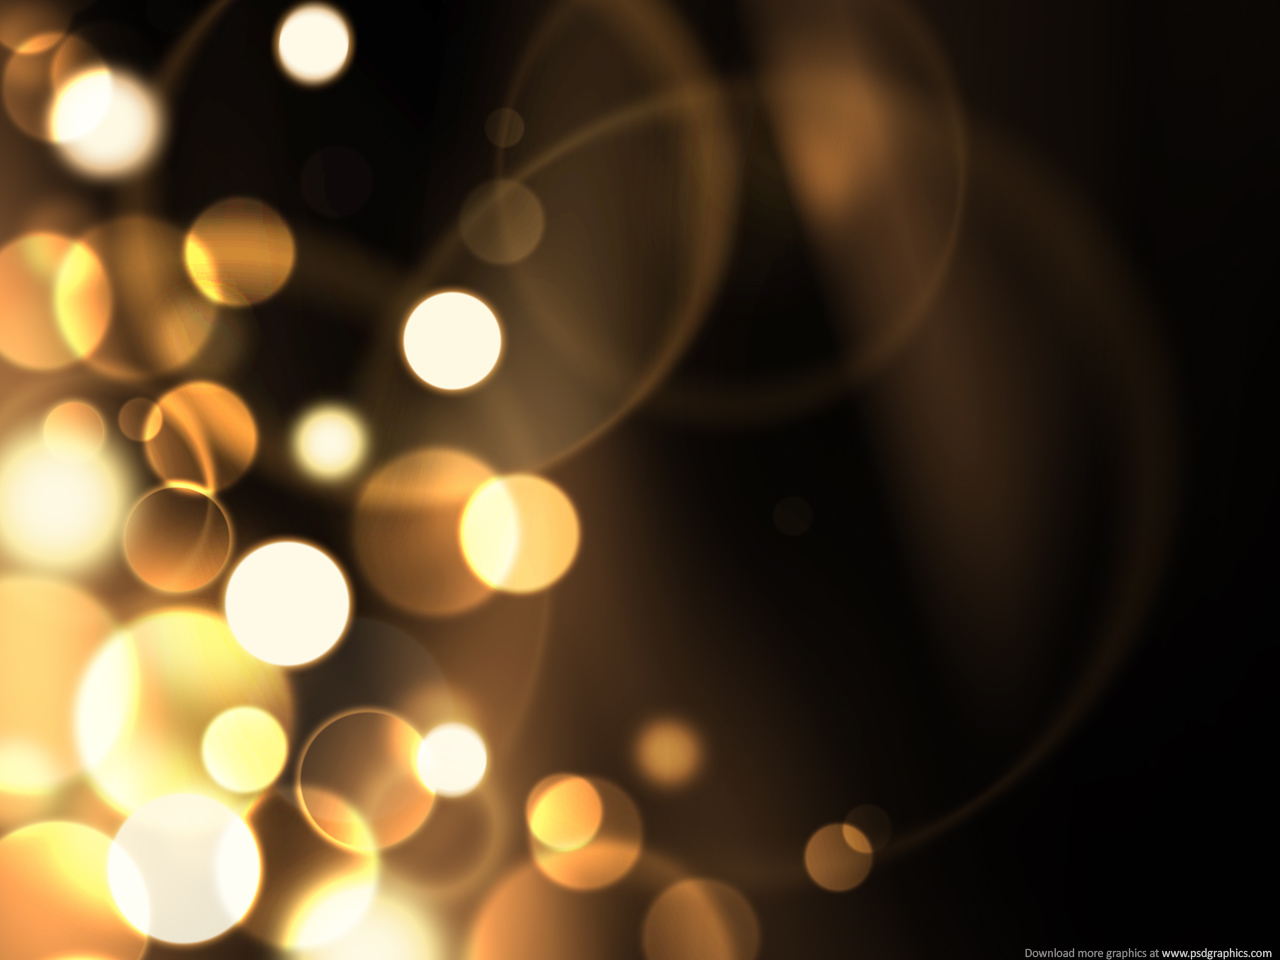 blurry sparkles background psdgraphics